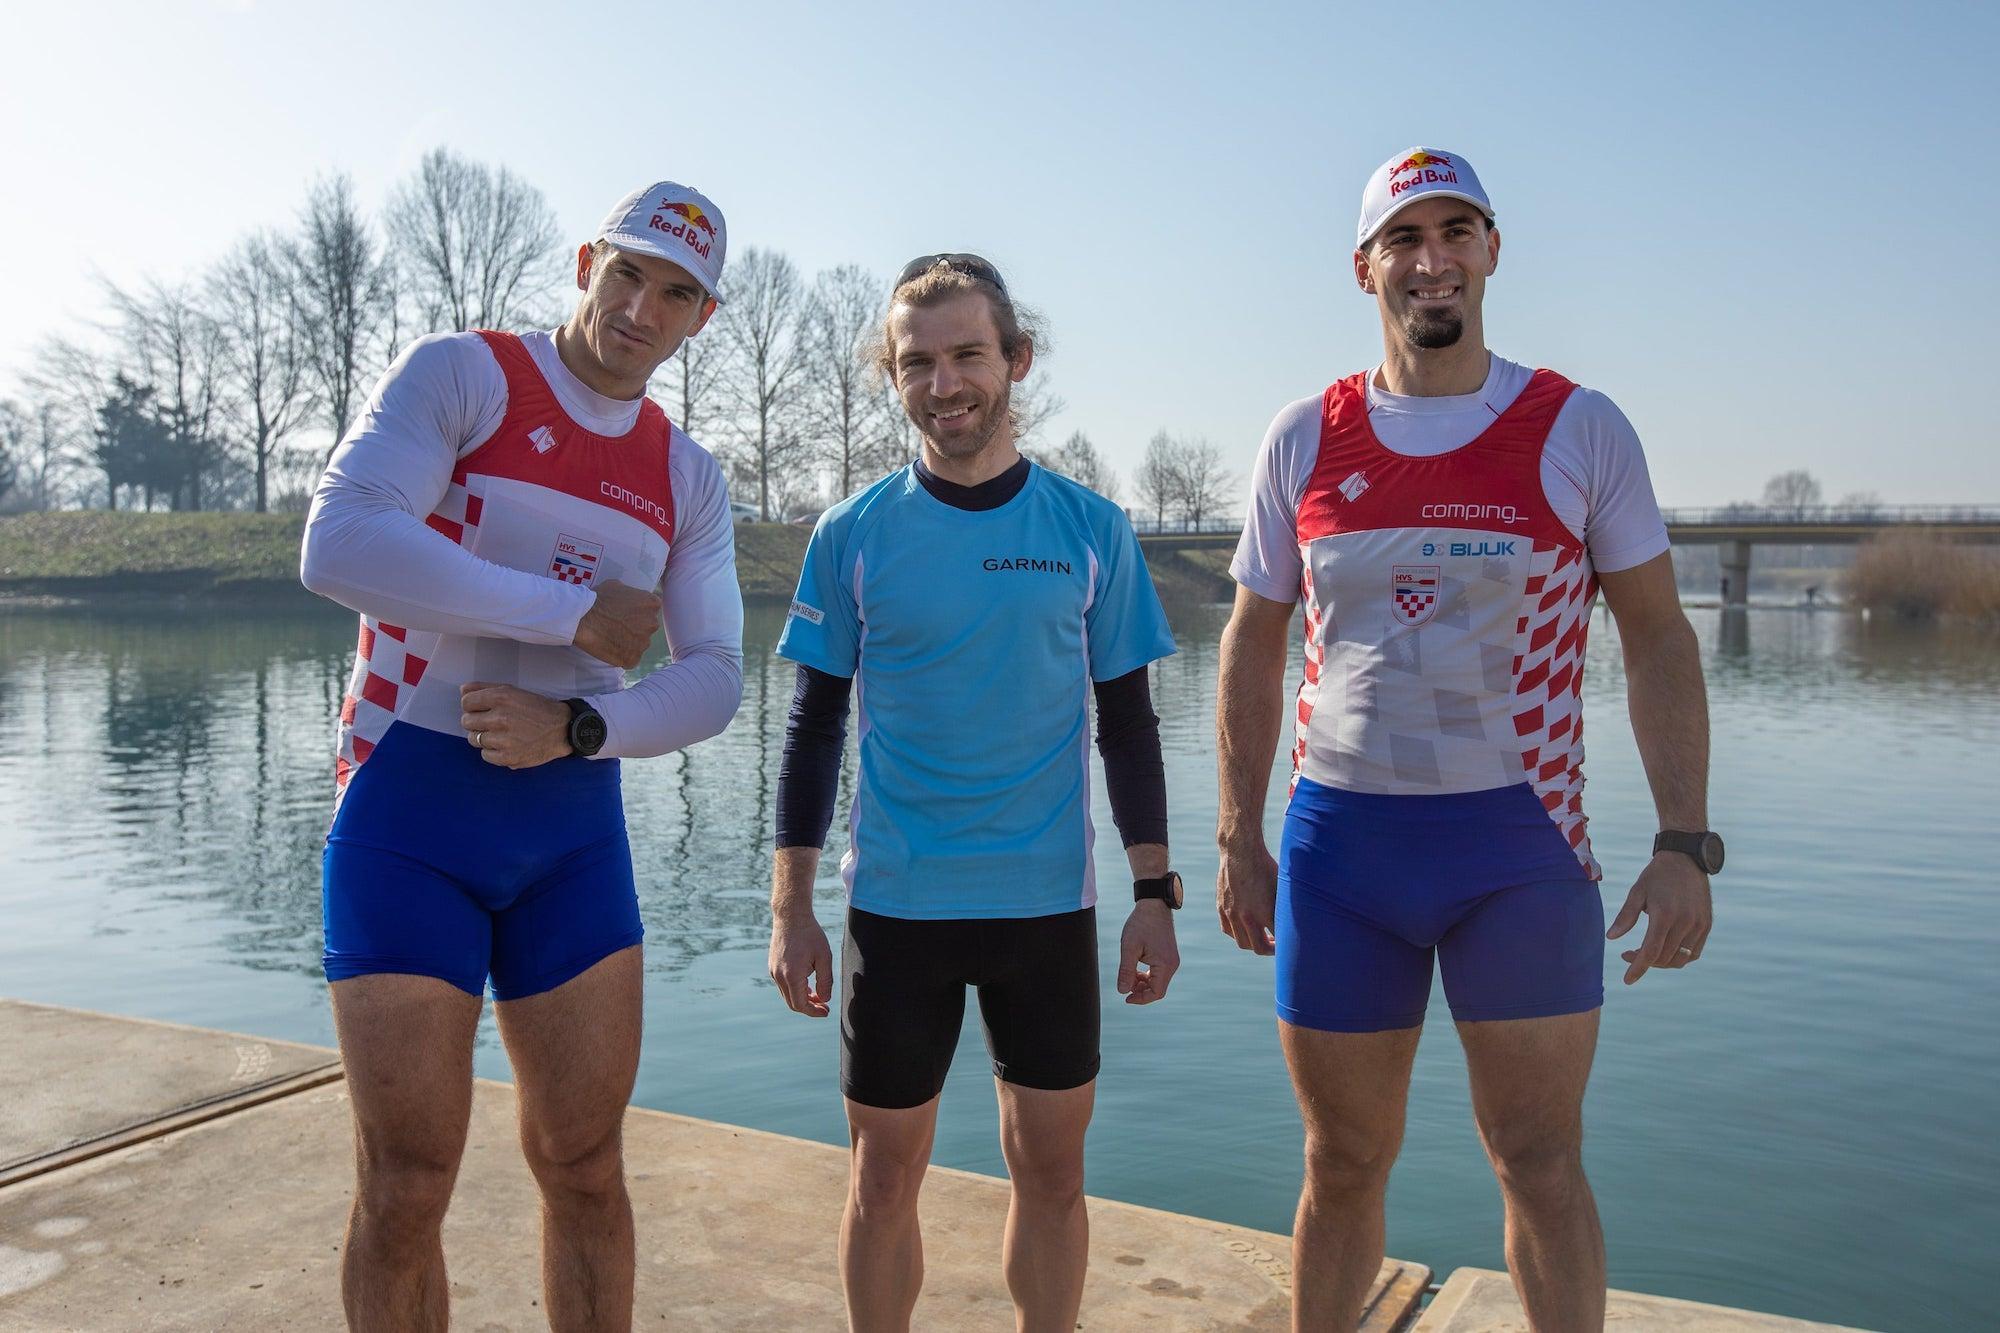 Braća Sinković i Dejan Radanac isprobali su Garmin Enduro